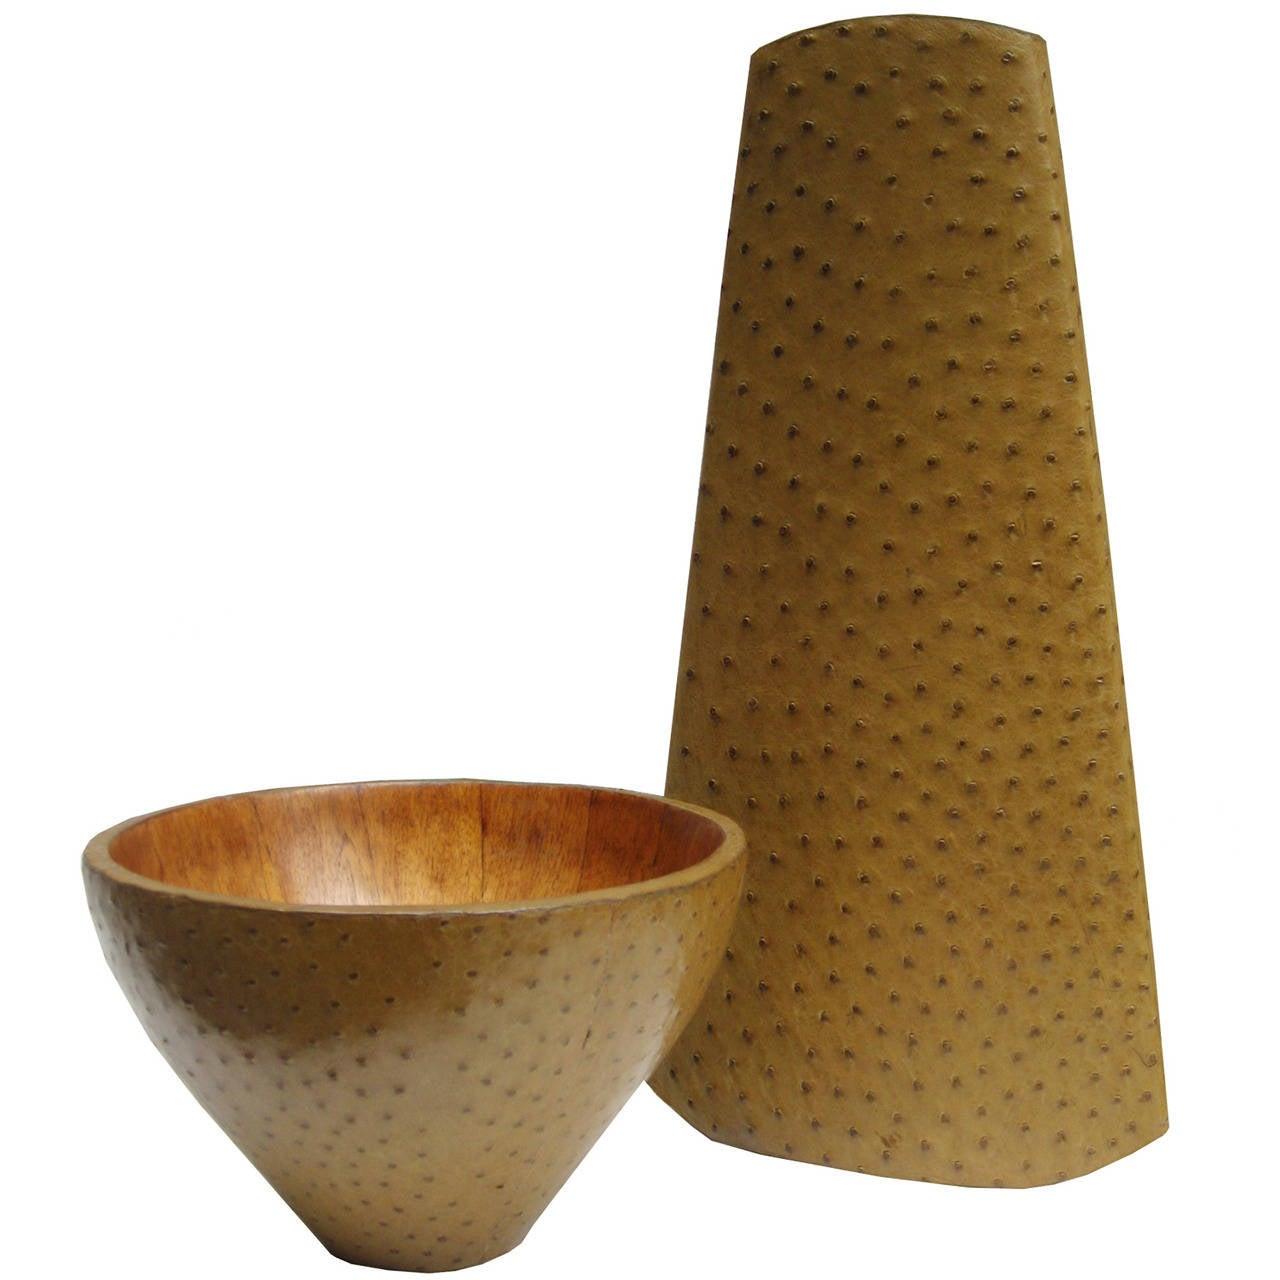 R&Y Augousti Vase and Bowl Set For Sale